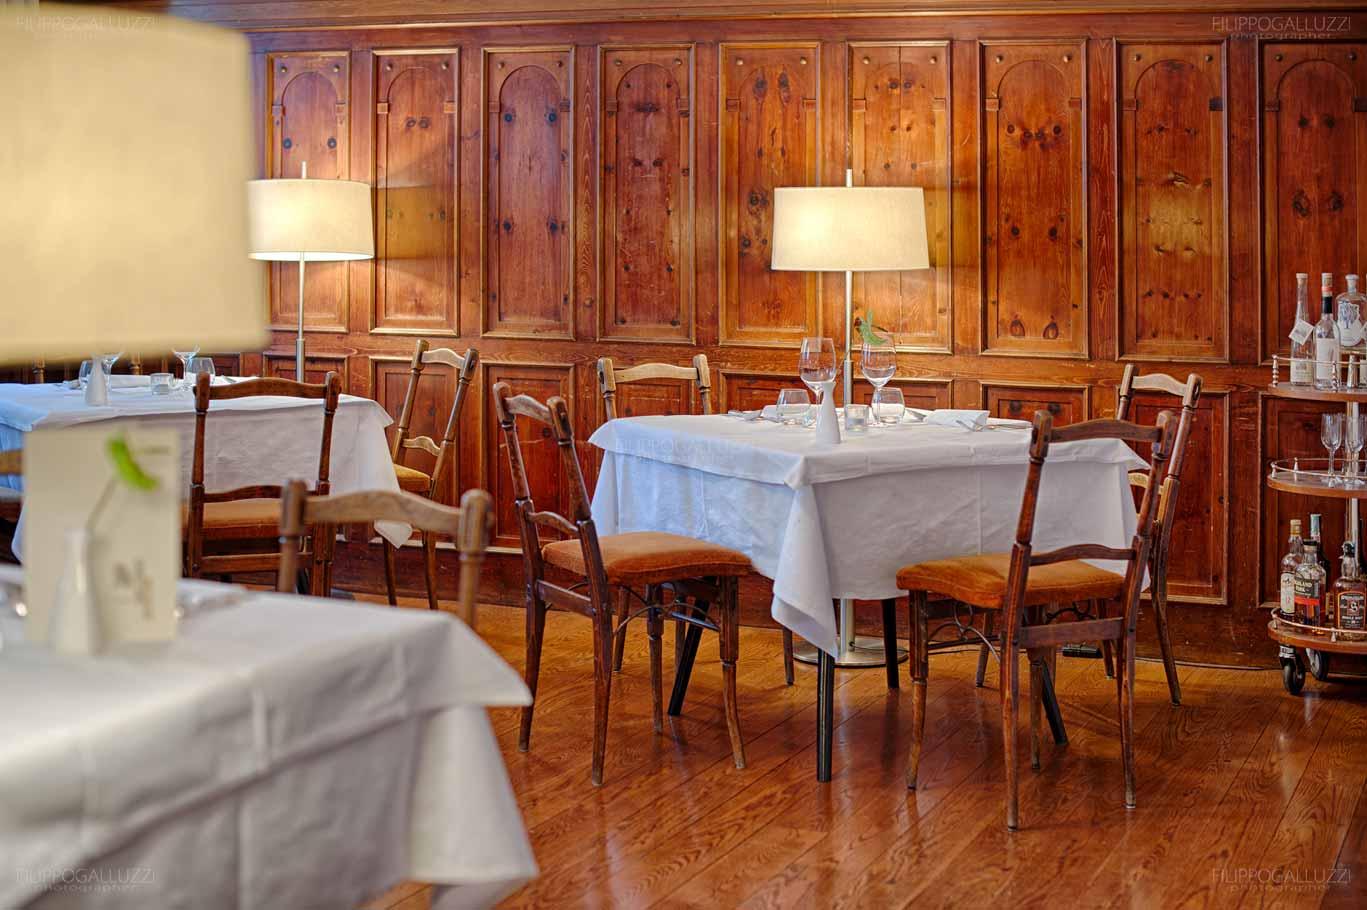 San Candido Pustertal, Hotel Grauer Bar